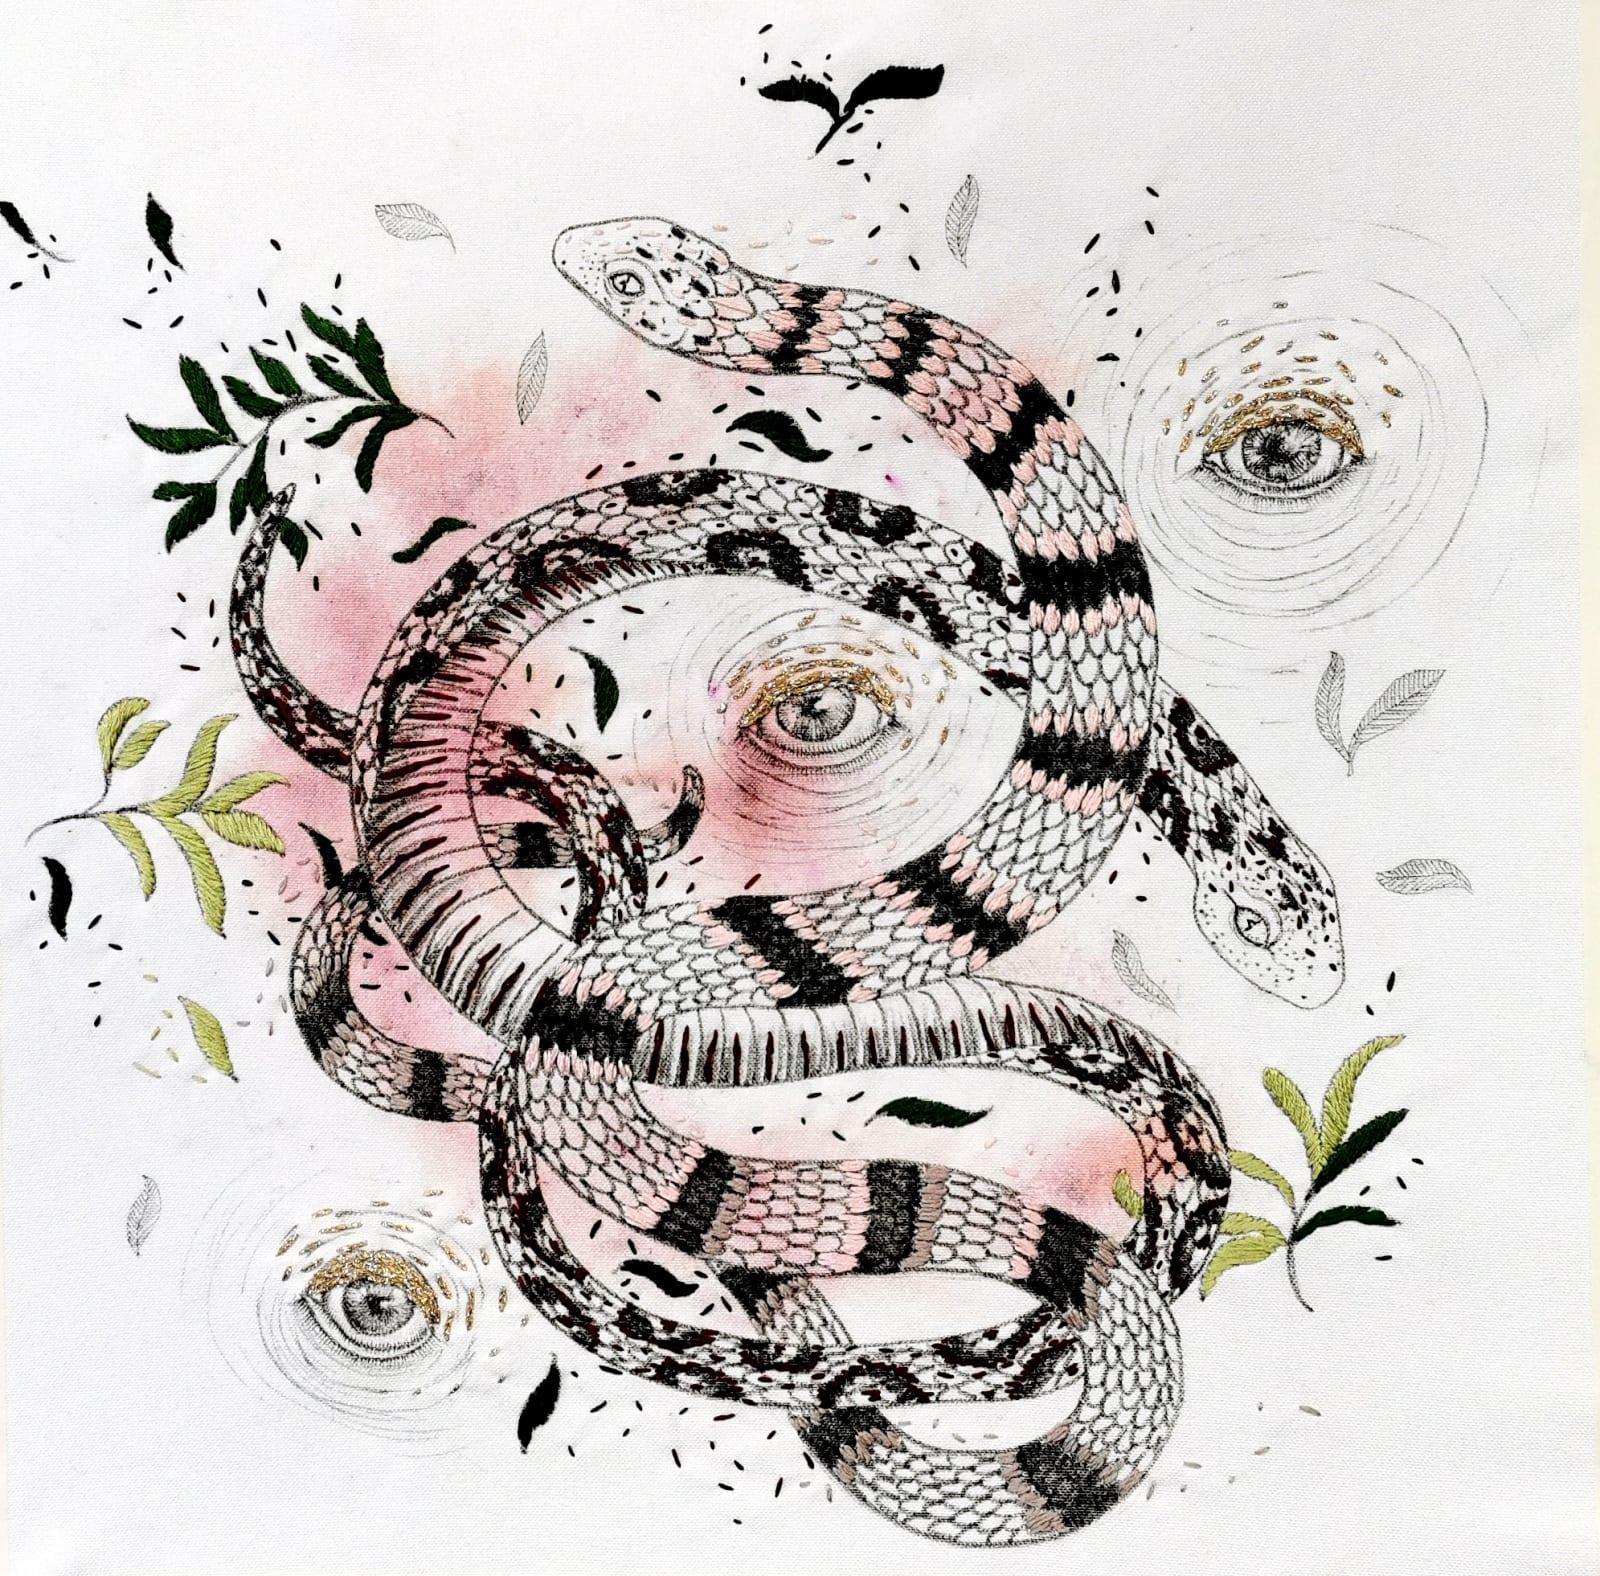 Giulia Ronchetti. Mother Snake, 2020. Acrylic, watercolor, liquid ink, graphite, cotton thread on fabric. 19.6 x 19.6in.